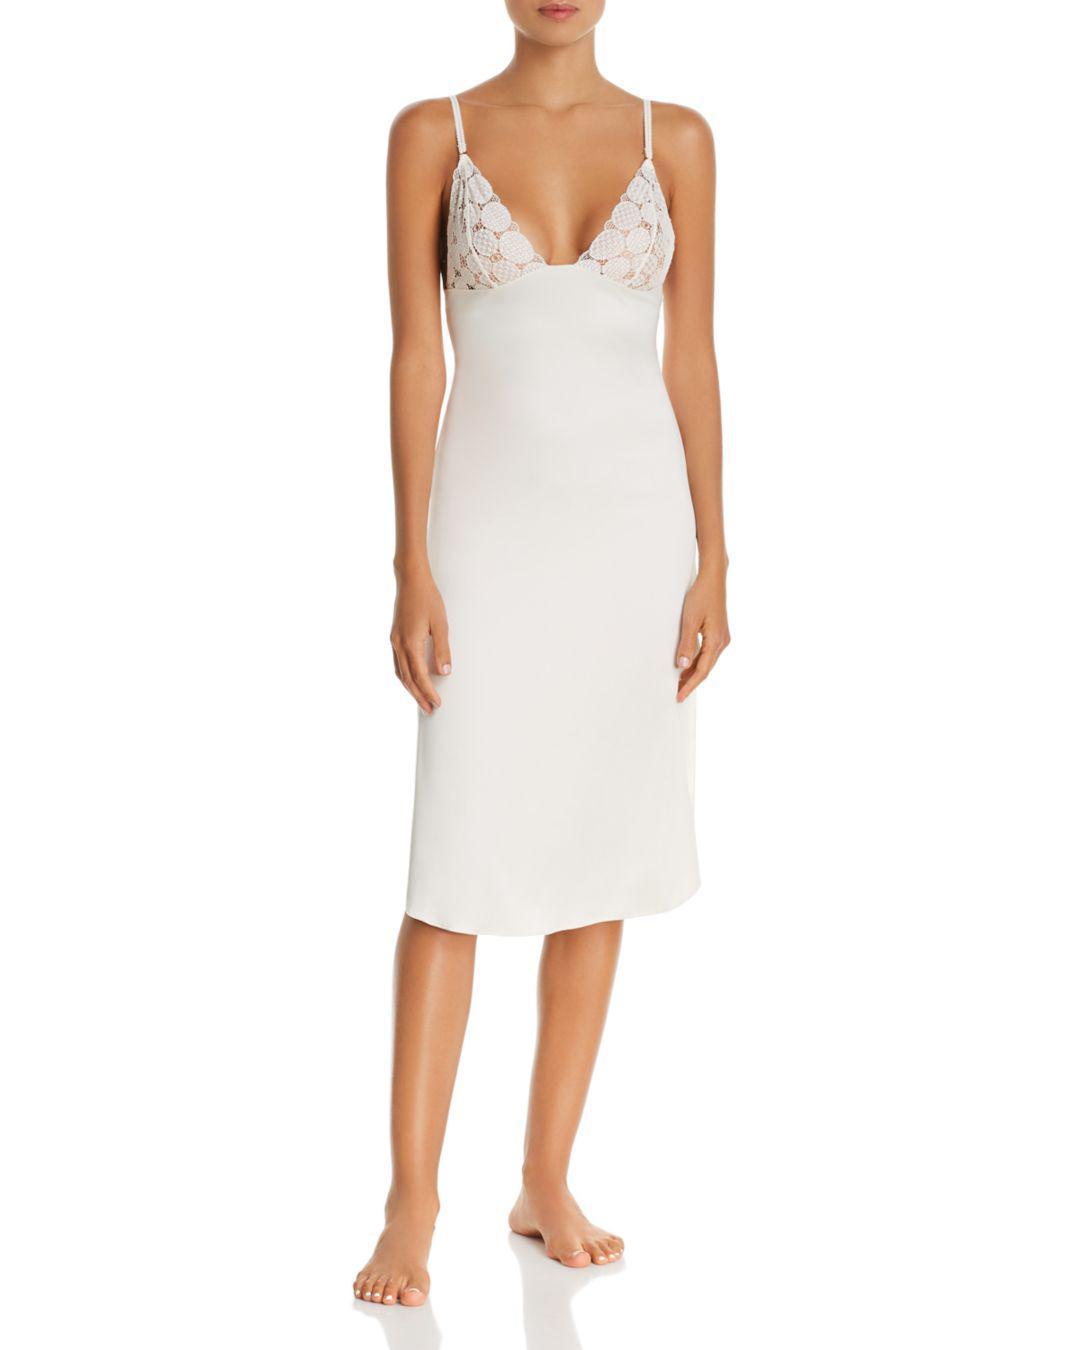 e56a8d45a4 Lyst - Heidi Klum Olivia Dawn Chemise in White